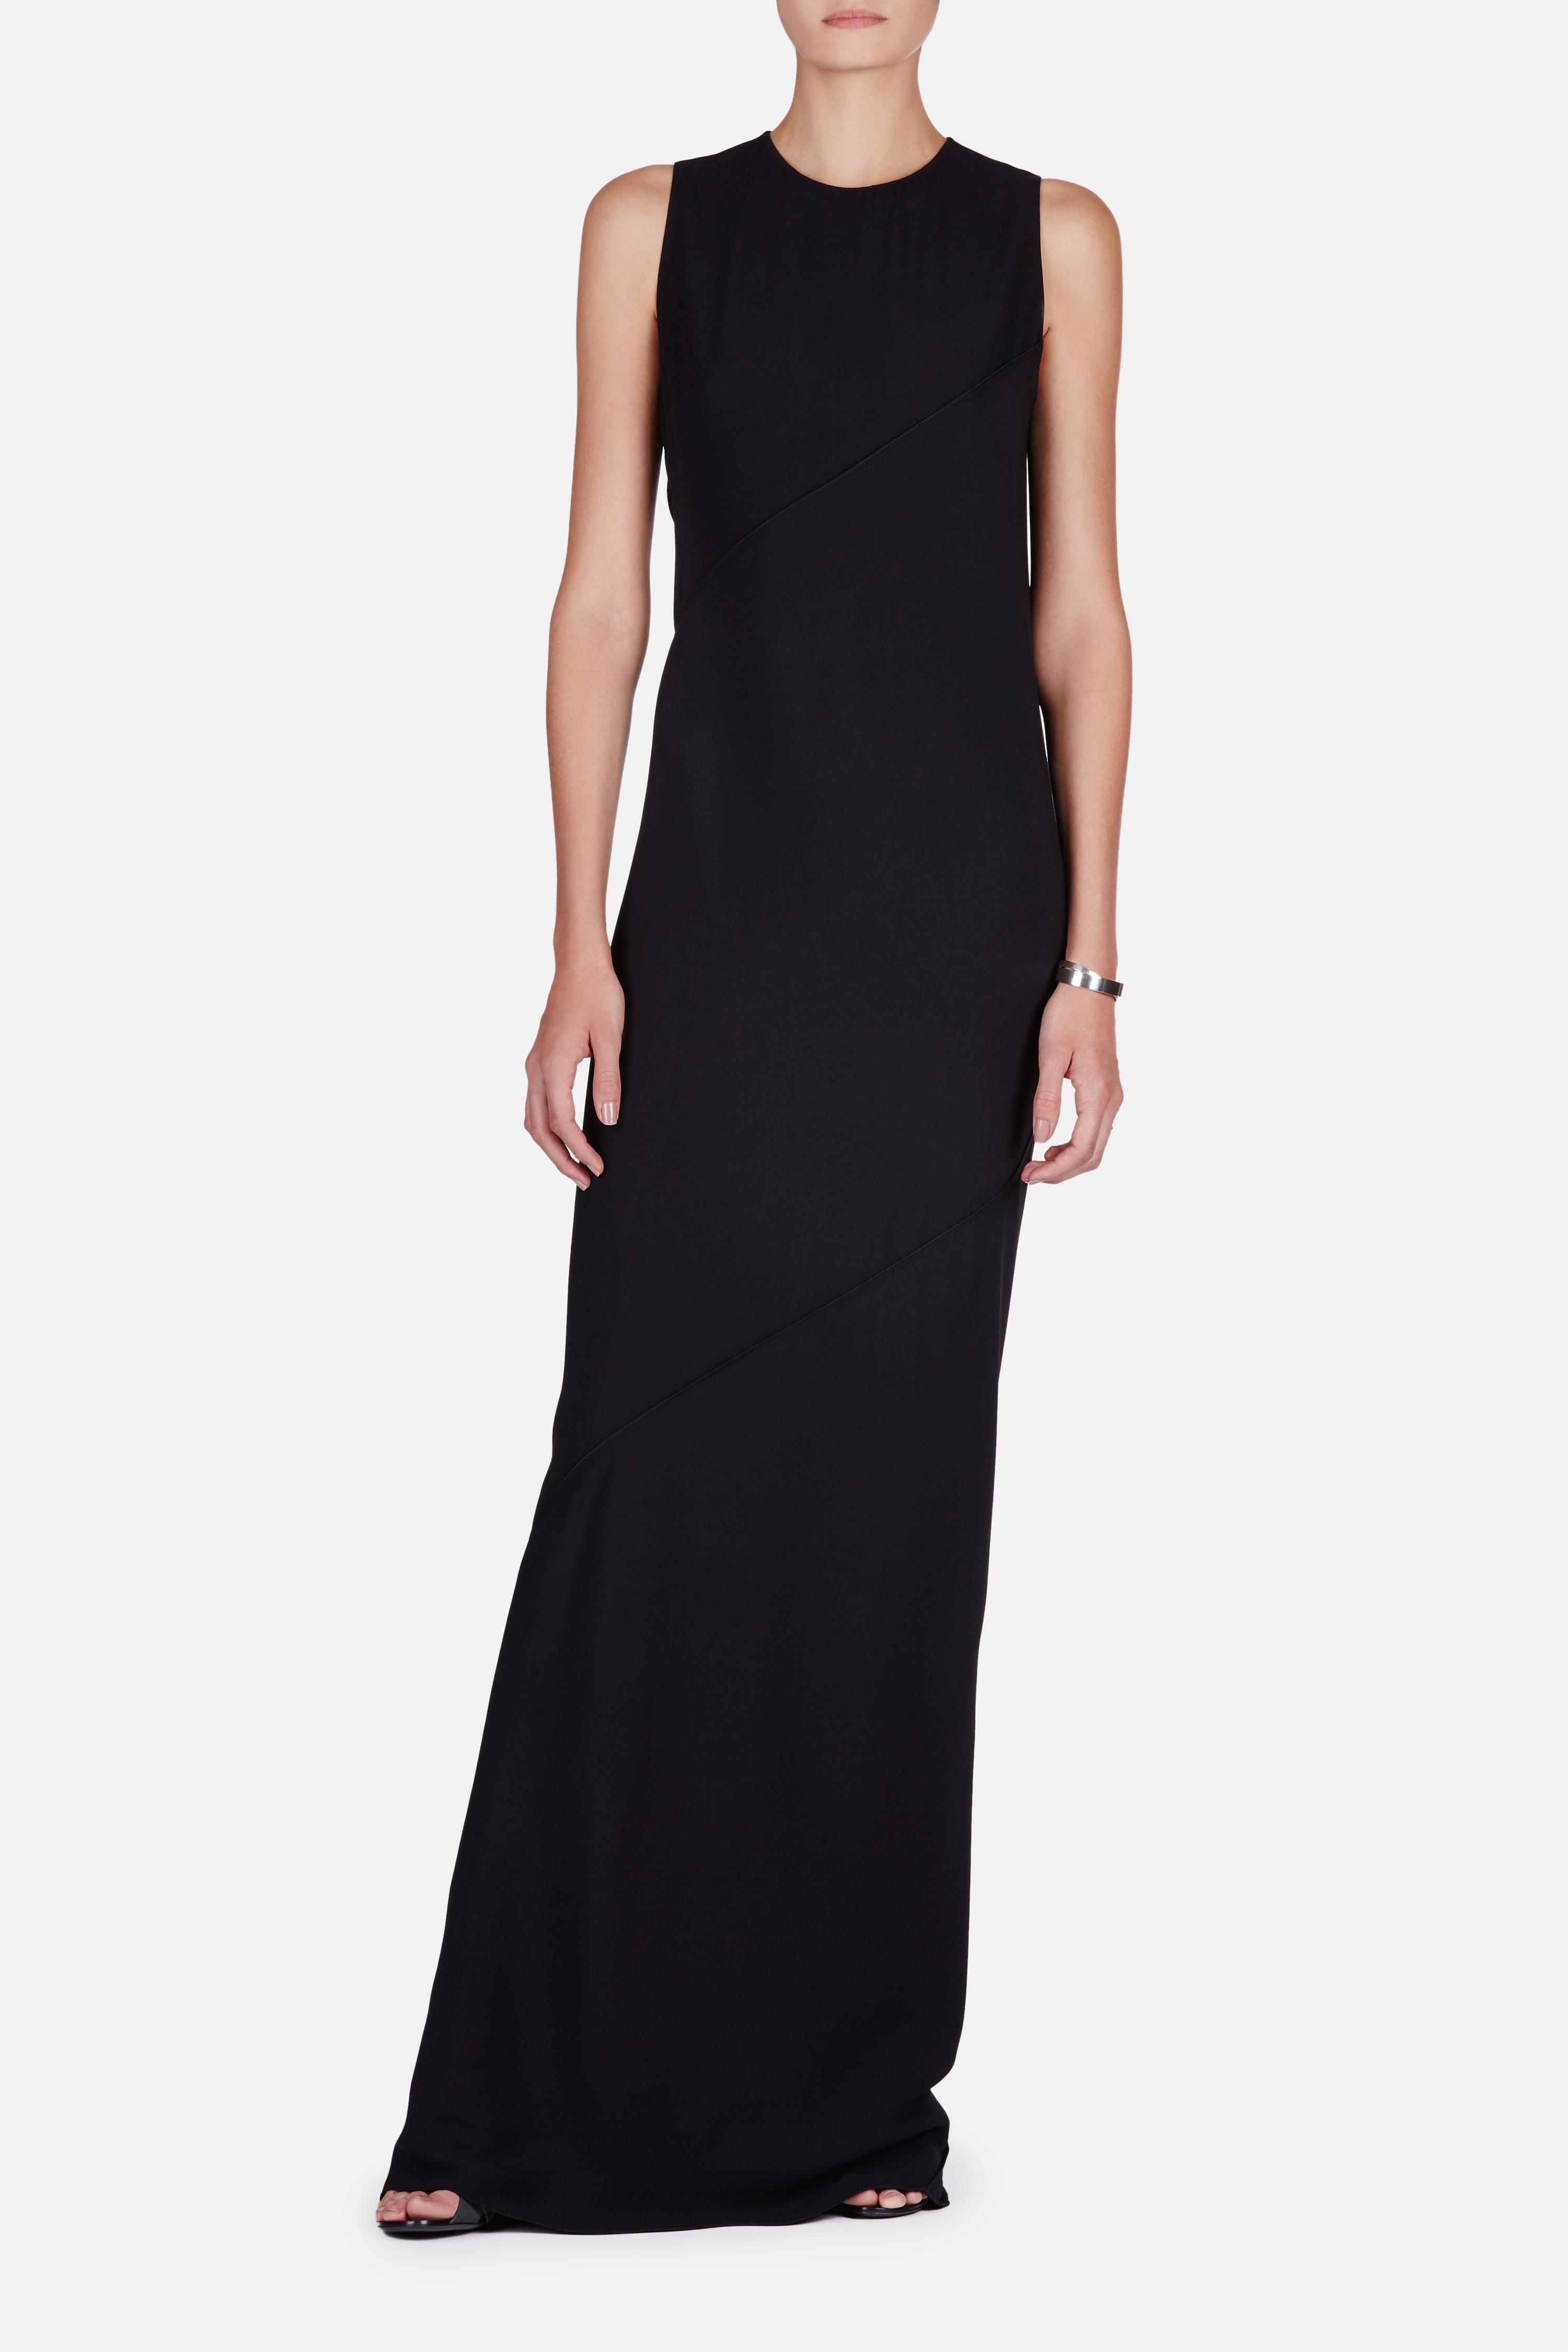 Lyst - Proenza Schouler Sleeveless Long Dress in Black